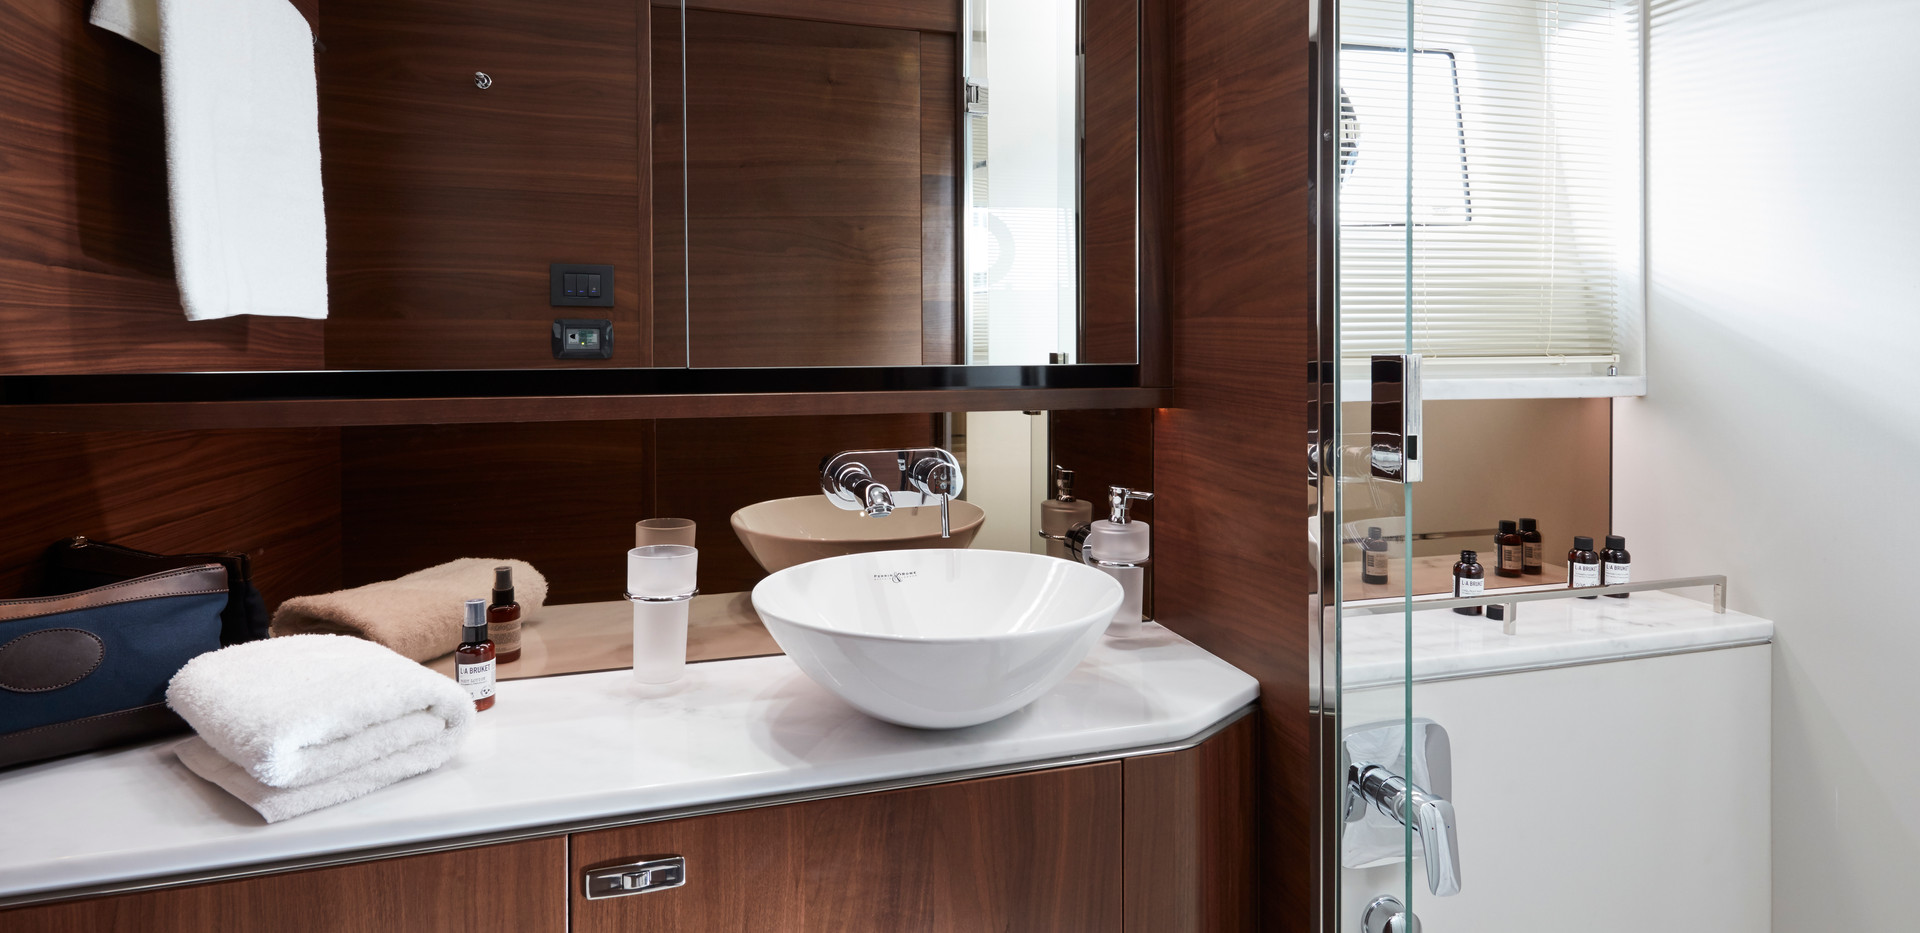 62-interior-owners-bathroom-american-wal